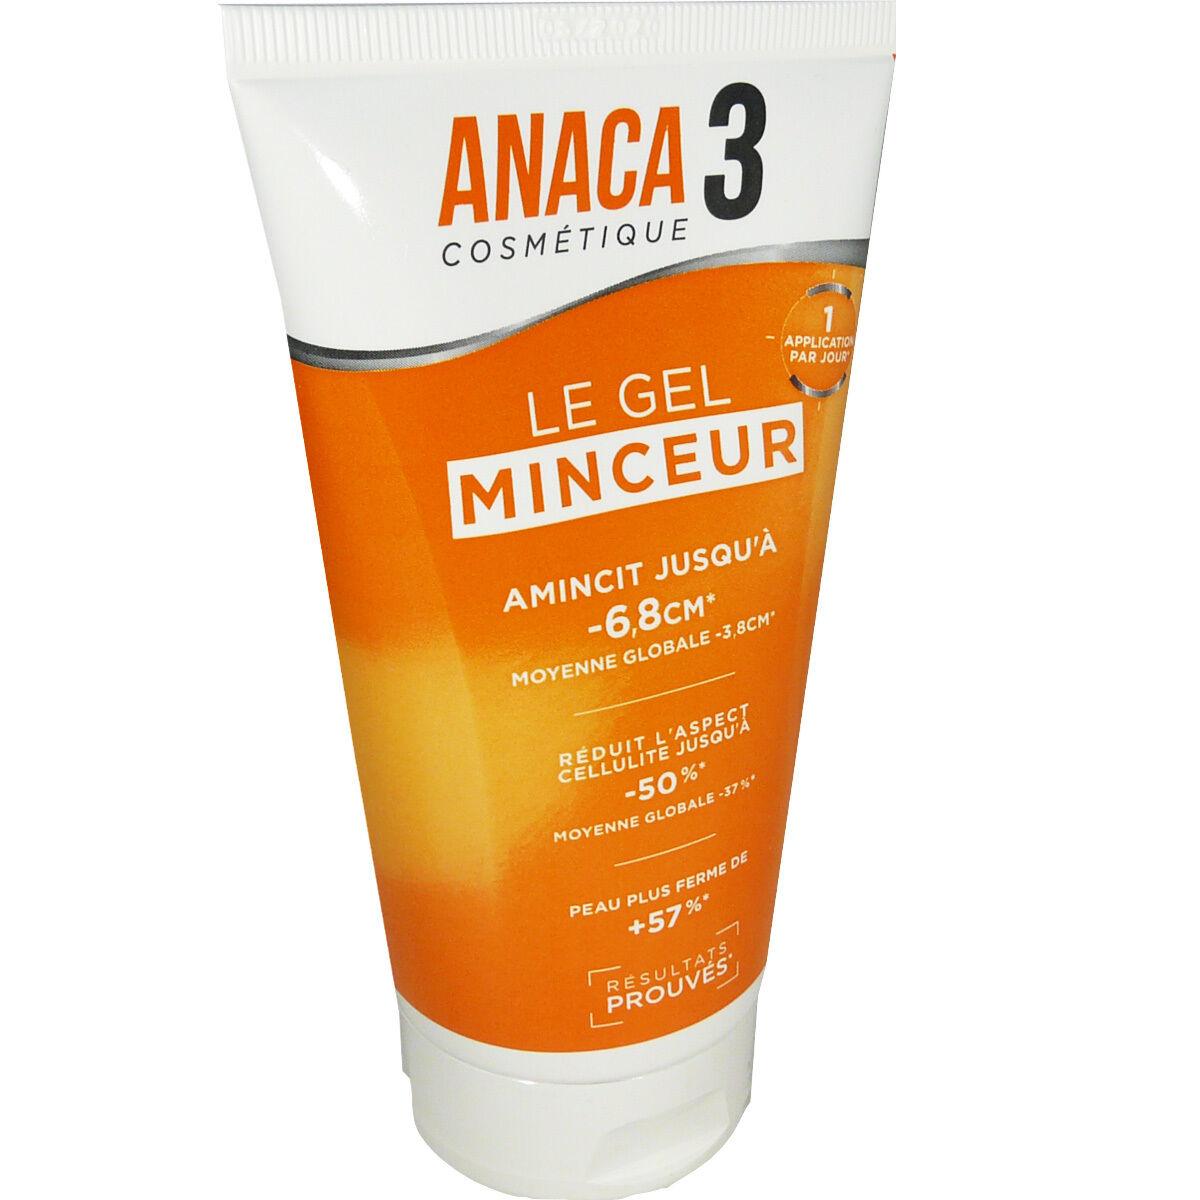 Anaca 3 cosmetique gel minceur 150 ml